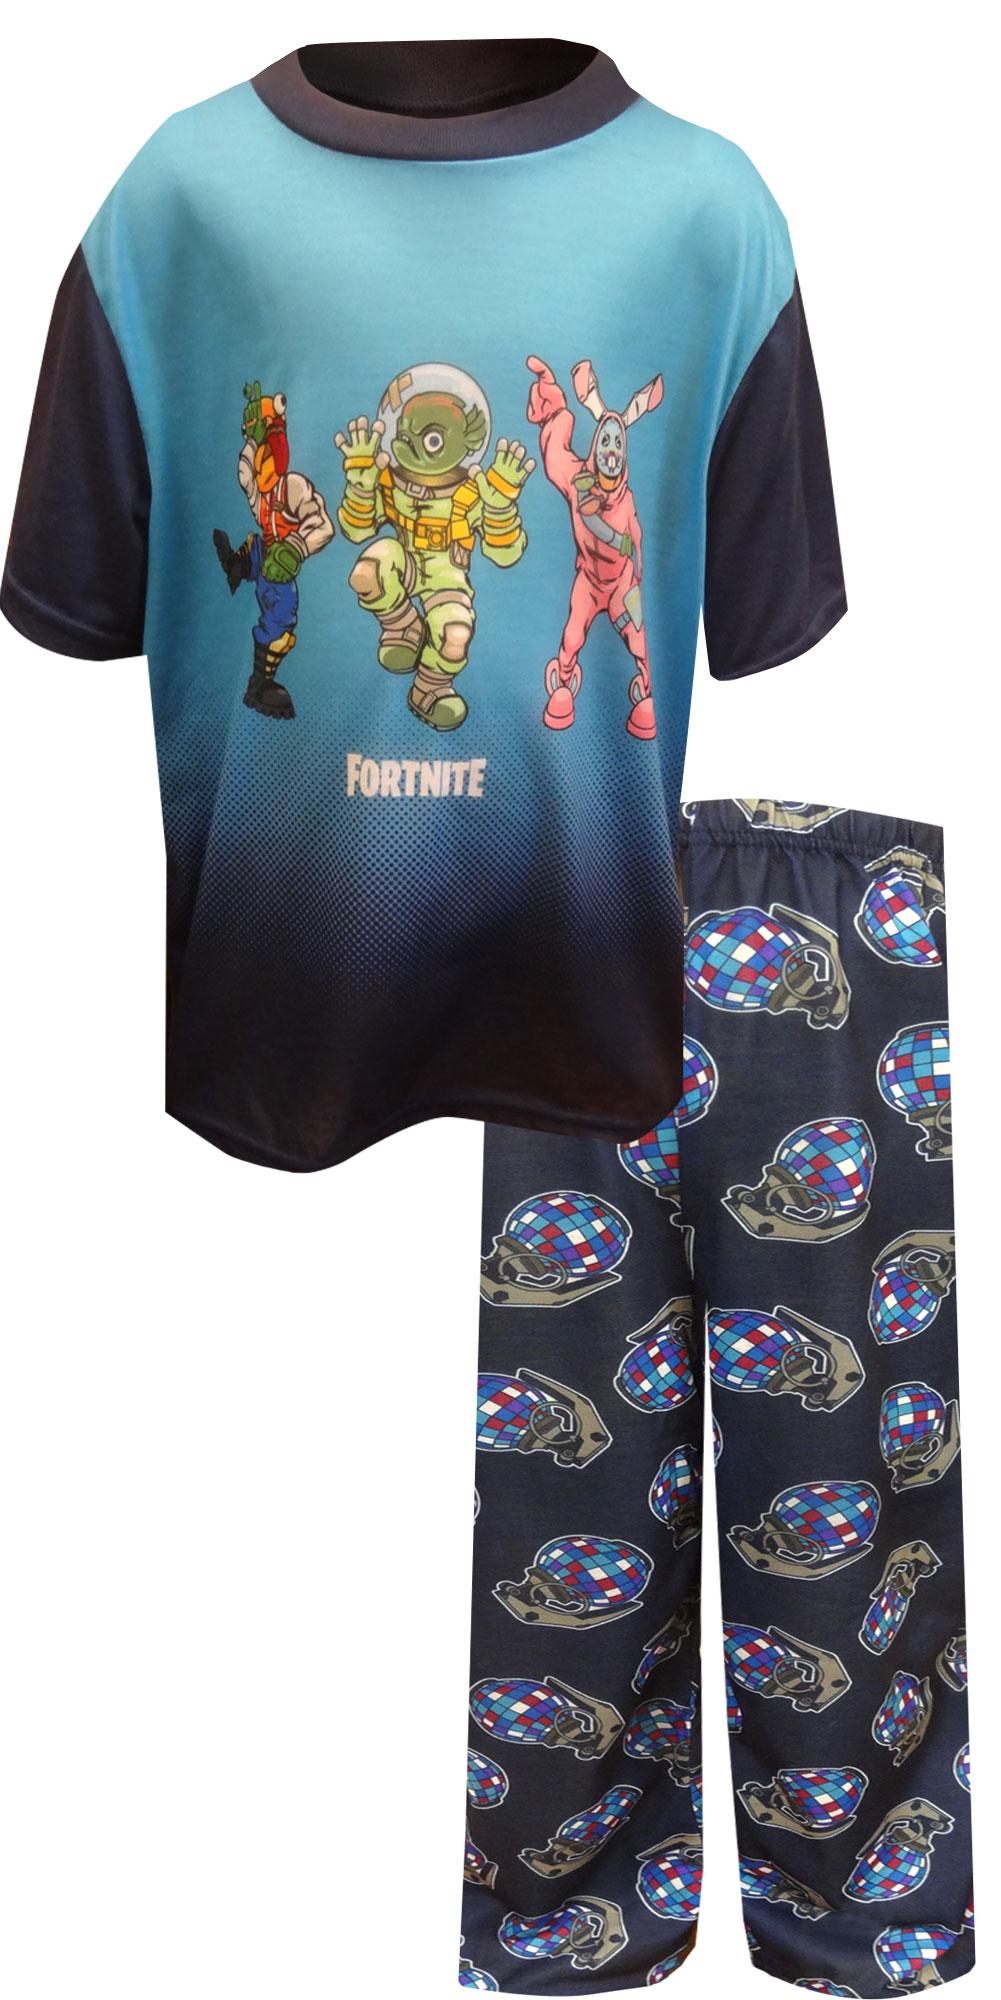 Image of Fortnite Victory Dance Short Sleeve Pajamas for boys